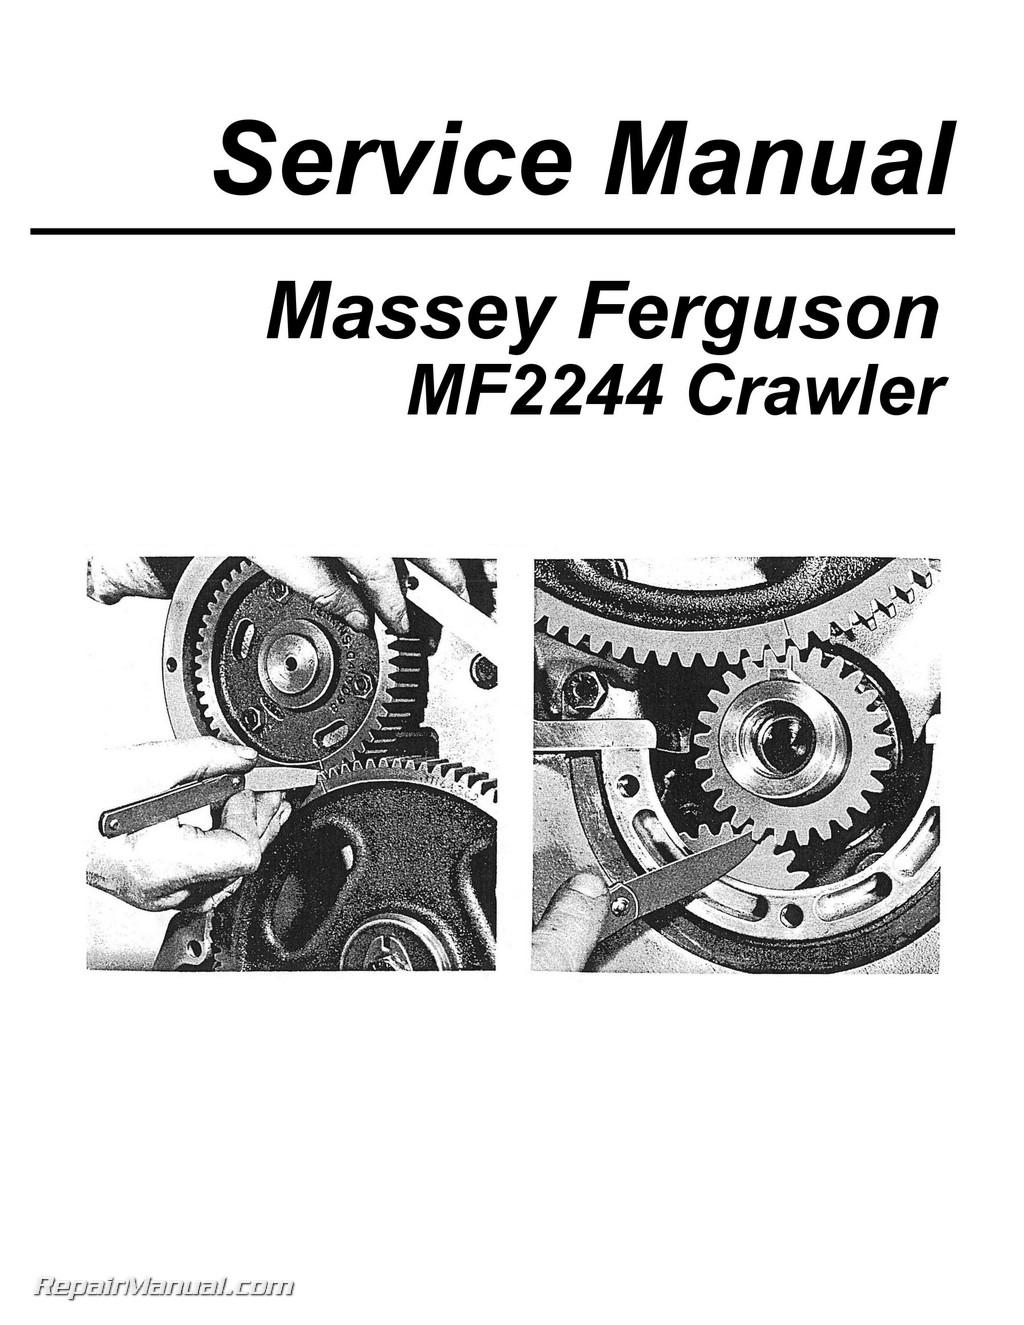 Massey Harris / Ferguson MF2244 Crawler Service Manual